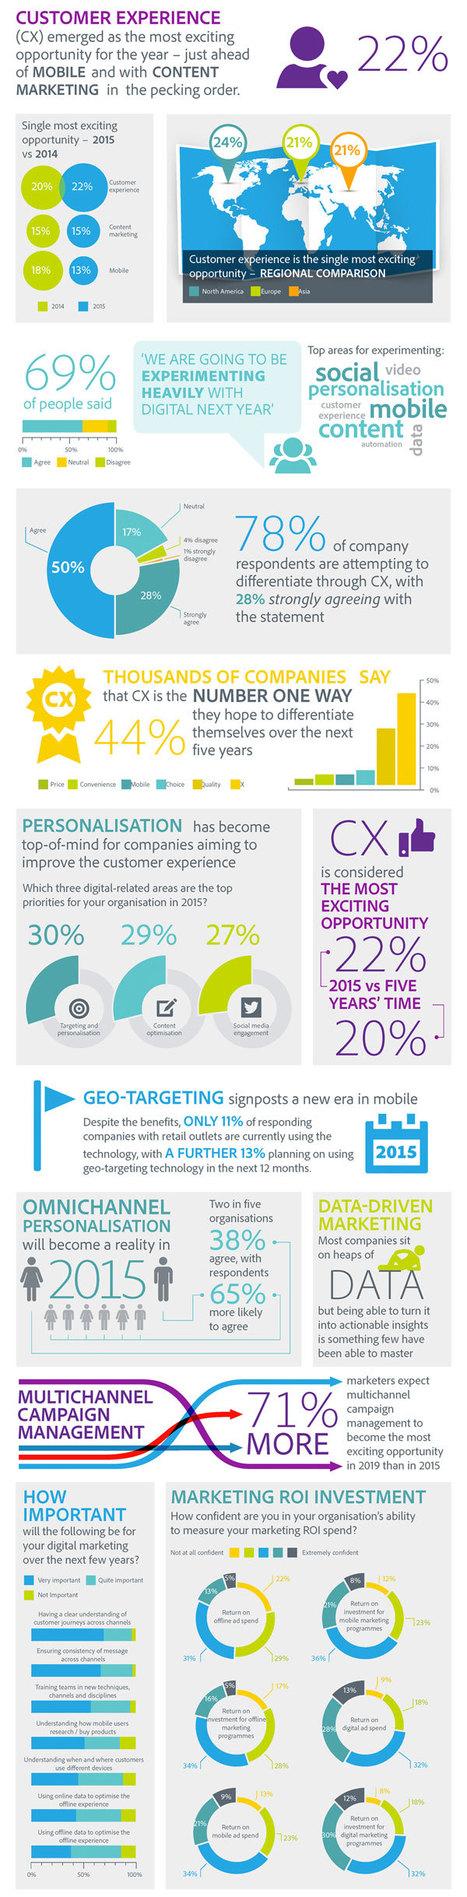 Digital Trends for 2015 #Infographic | Expertiential Design | Scoop.it